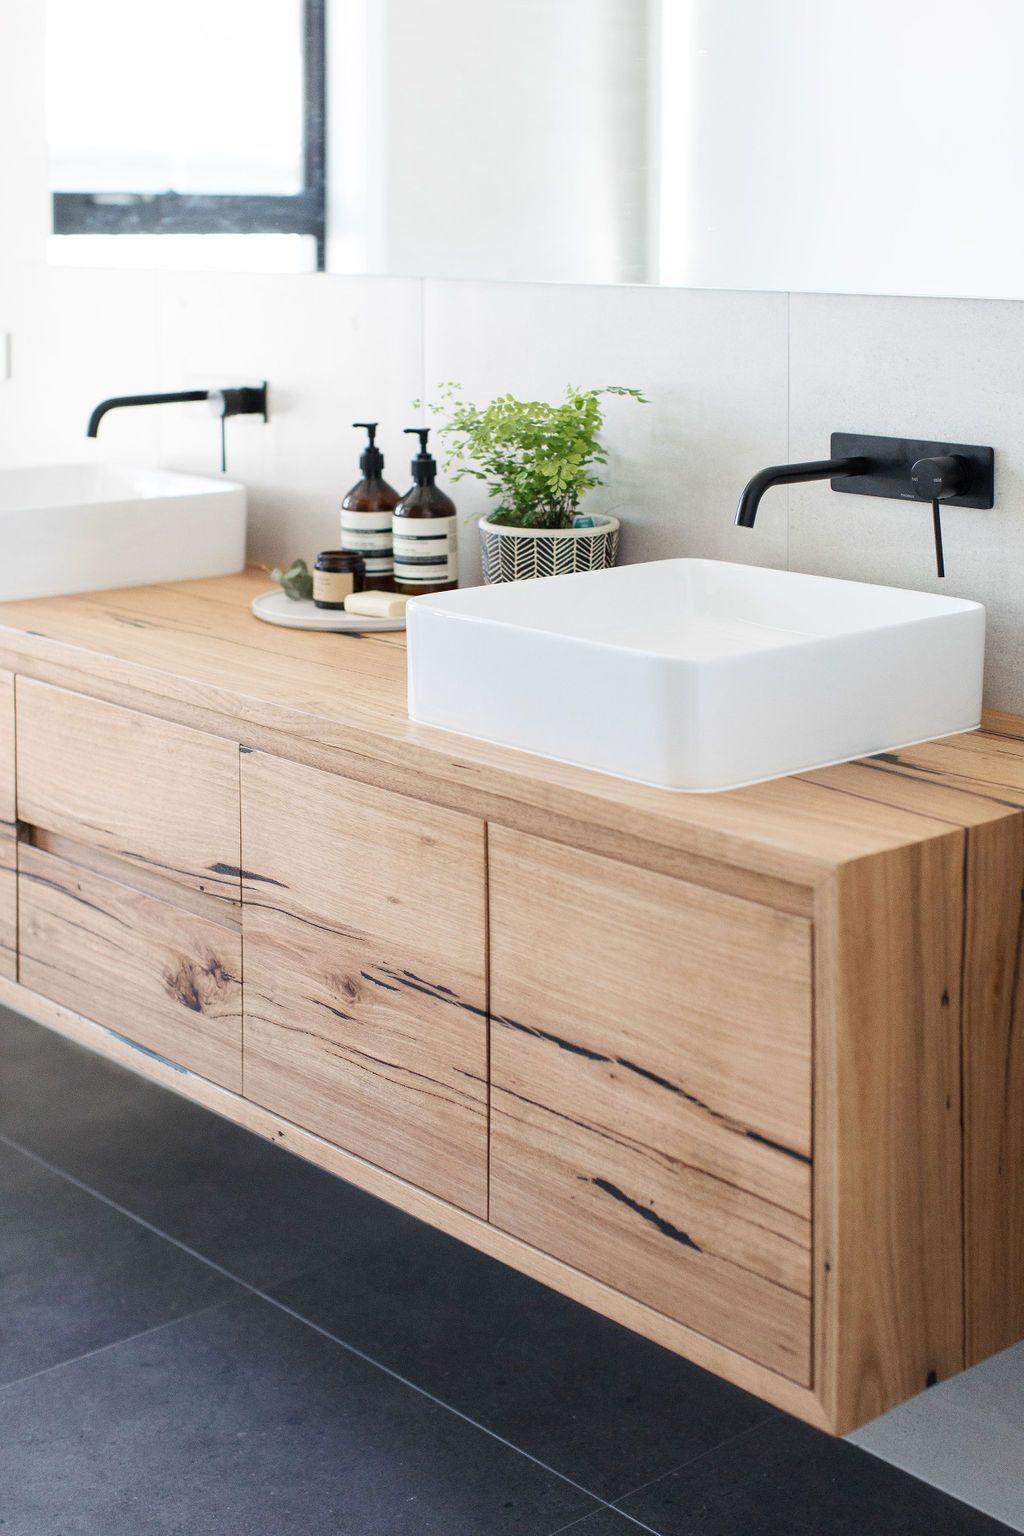 Photo of 30+ Wonderful Single Vanity Bathroom Design Ideas To Try – Page 37 – Home Decor Ideas